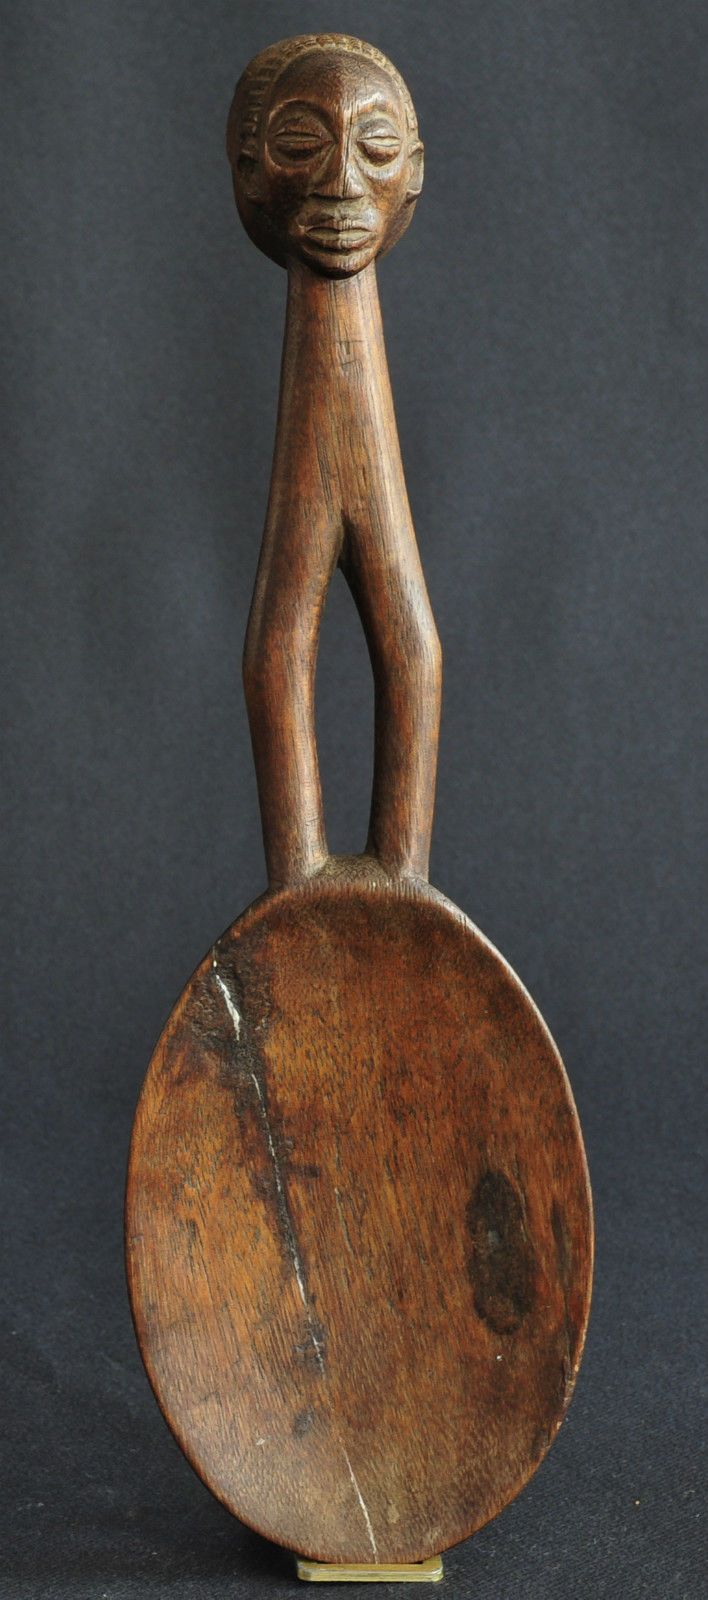 Cuillère Luba Hemba Congo spoon Löffel Arts Premiers Africain Africa Kongo | eBay